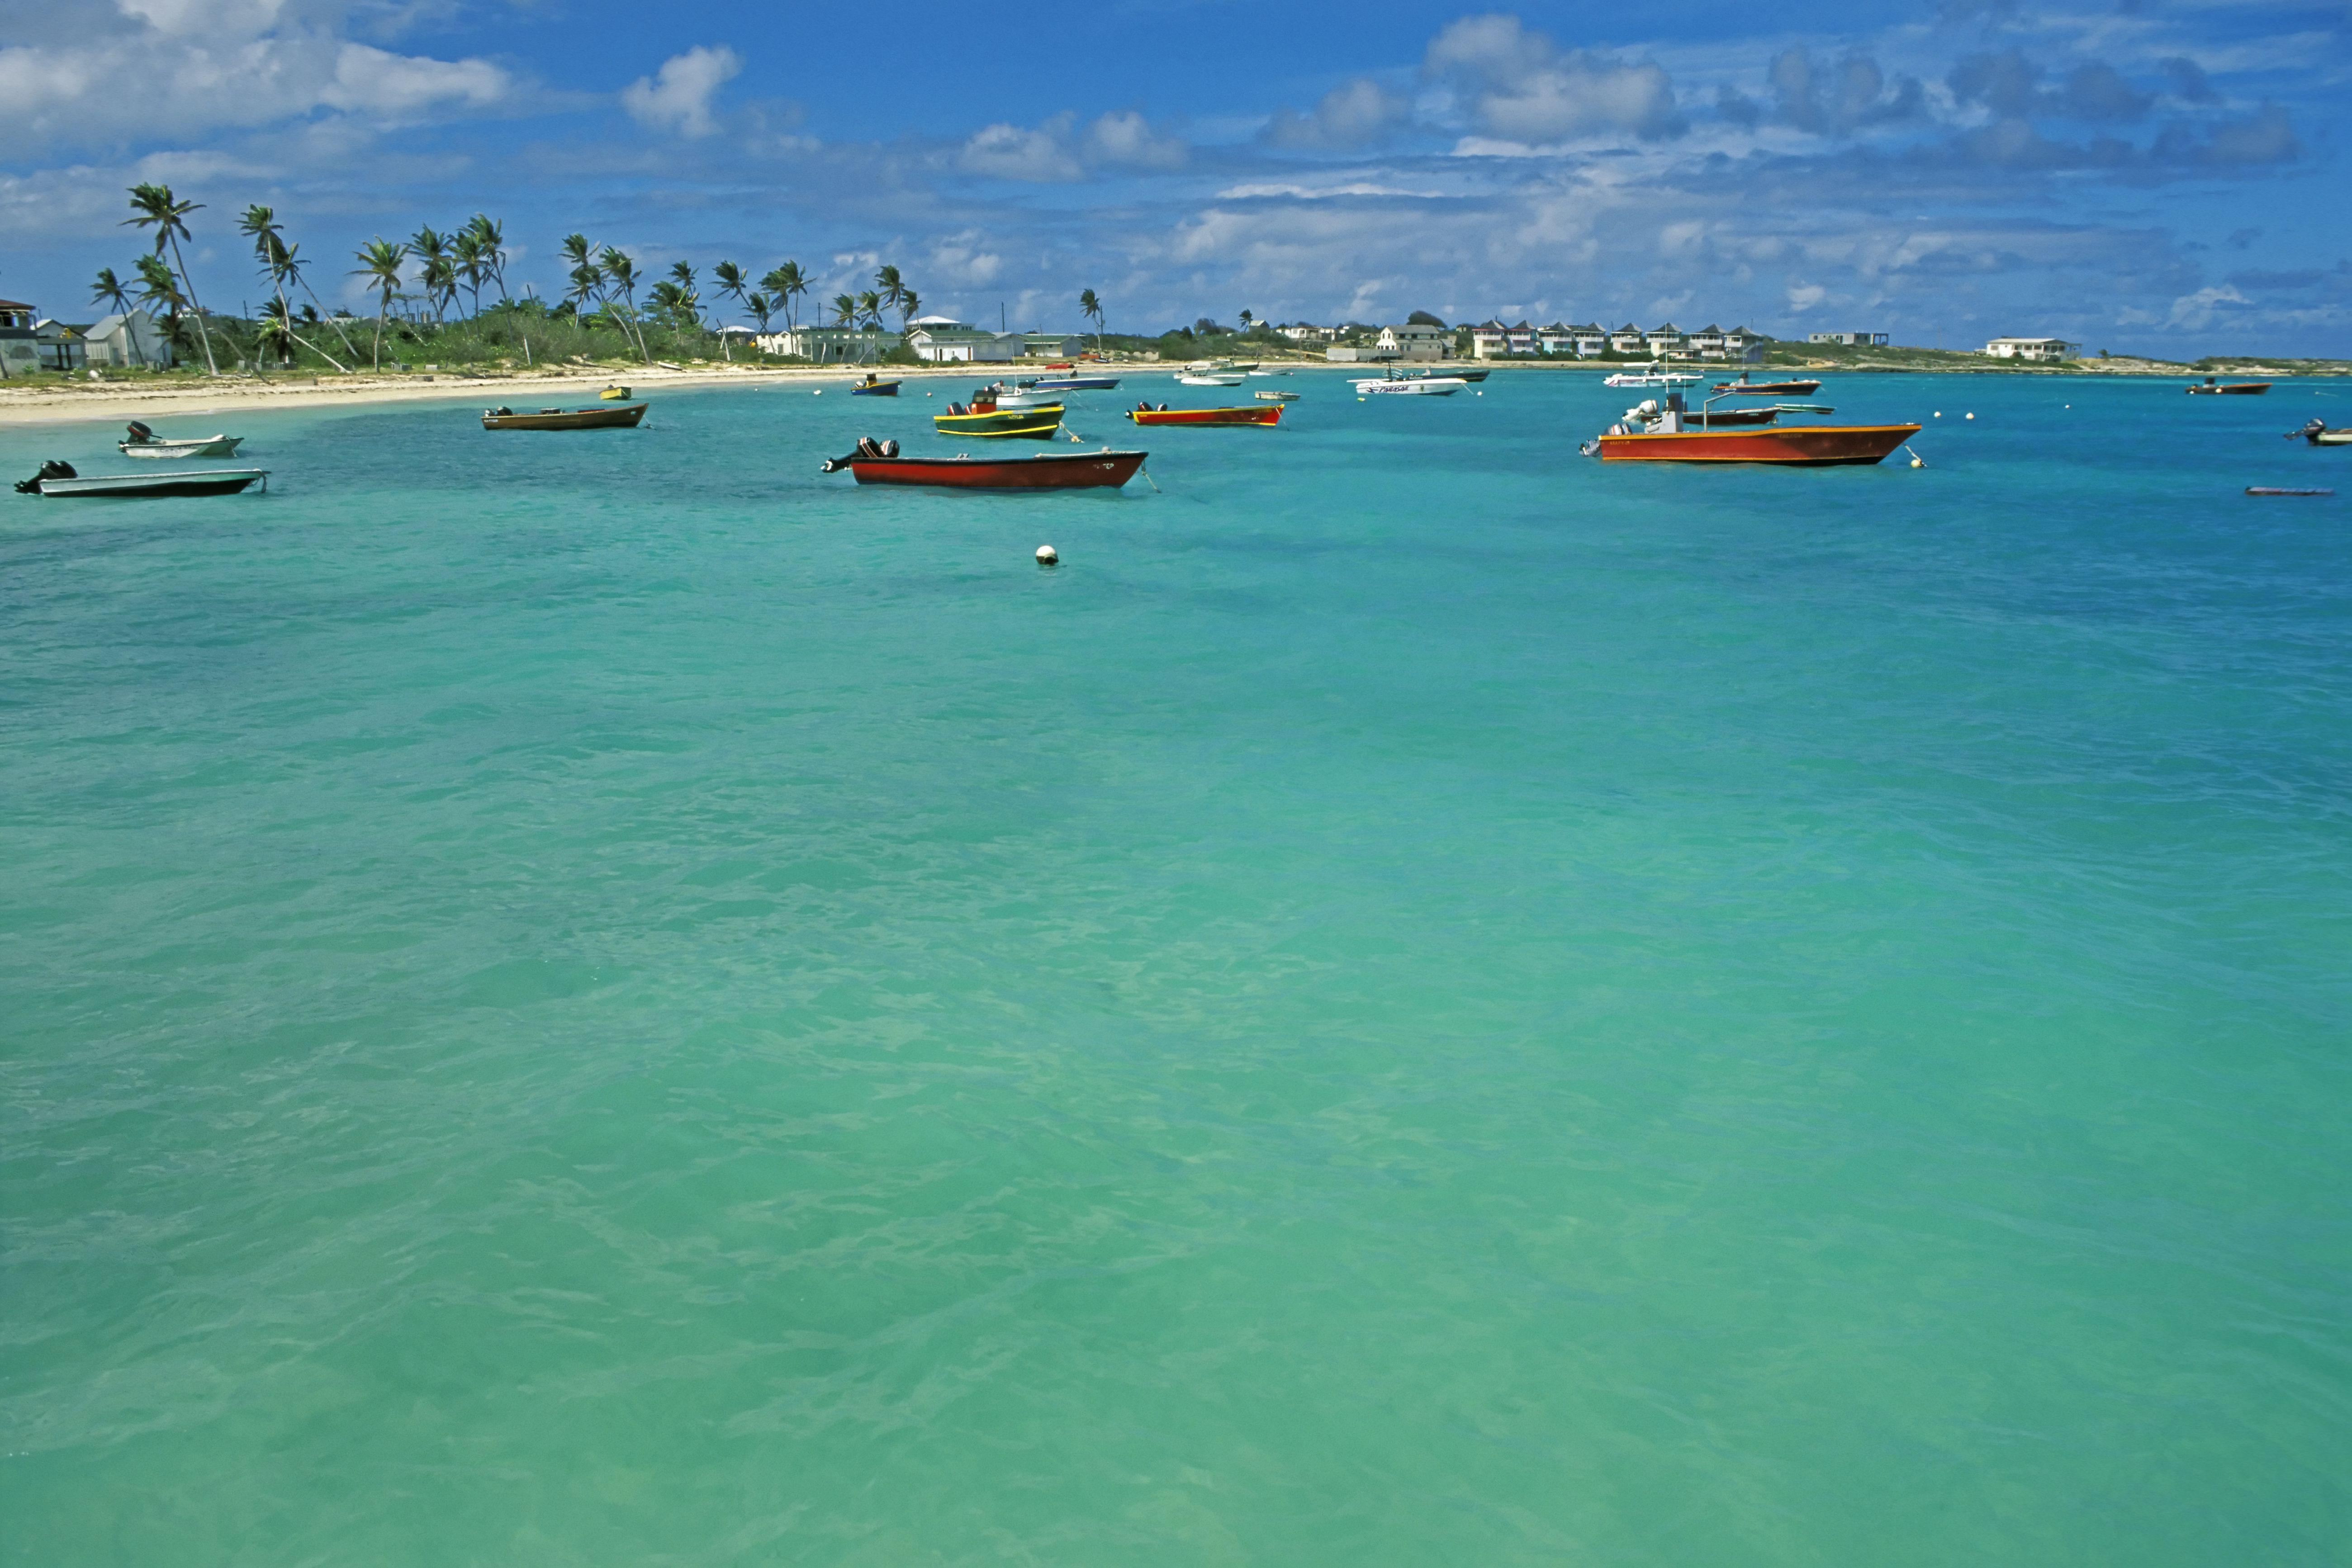 Caribbean, Antilles, Anguilla, Upper Shoal Bay, fishing boats and shore